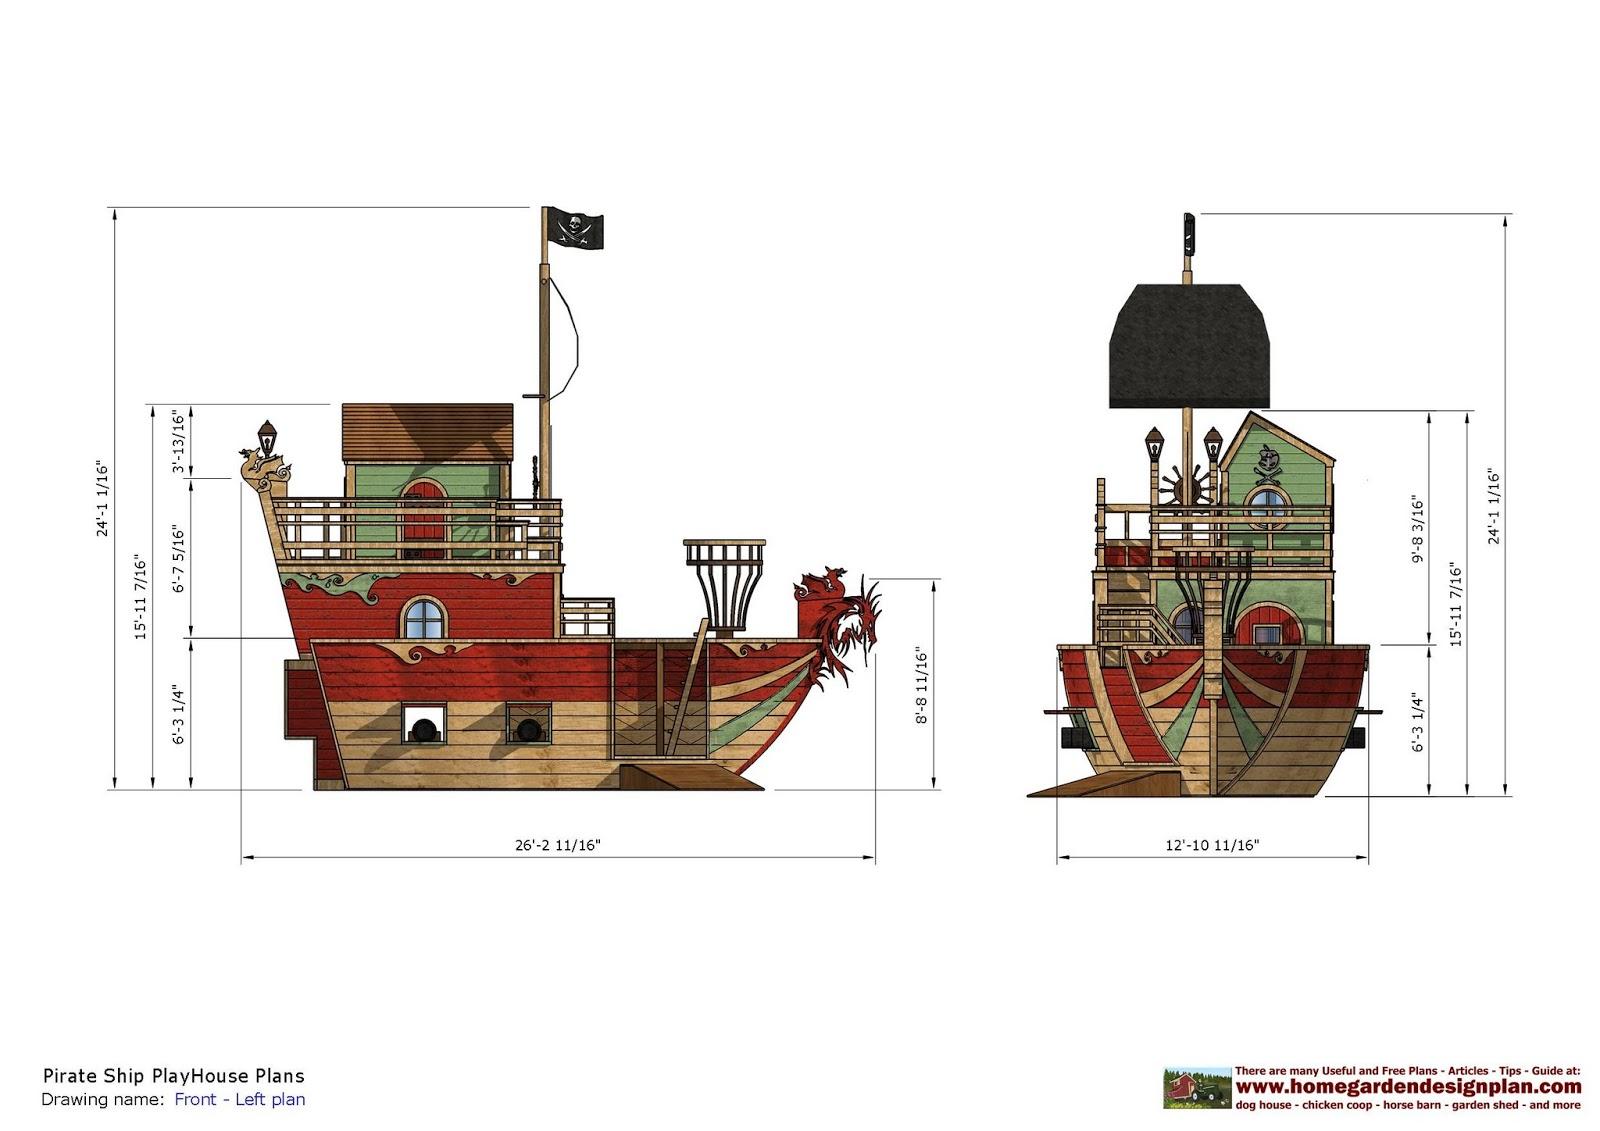 Pirate Ship Plans